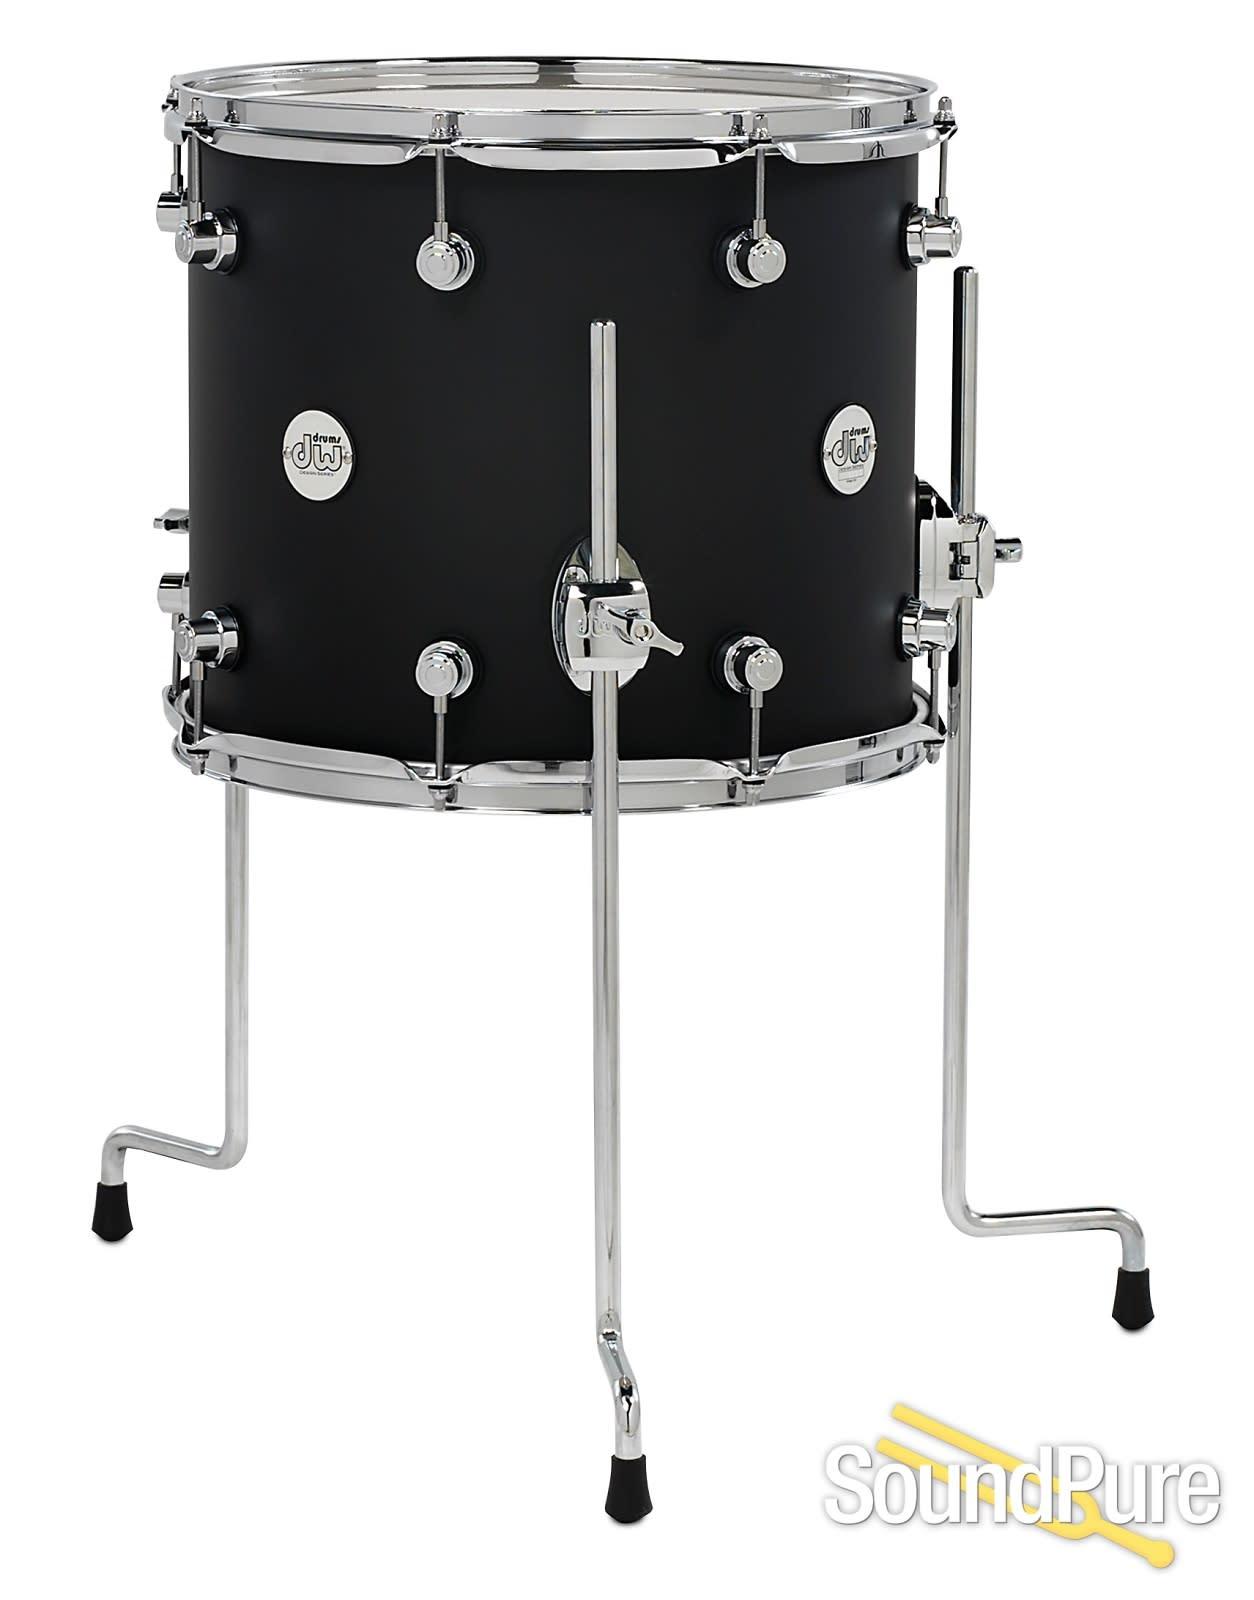 Dw design series 12x14 floor tom black satin sound pure for 14 floor tom for sale